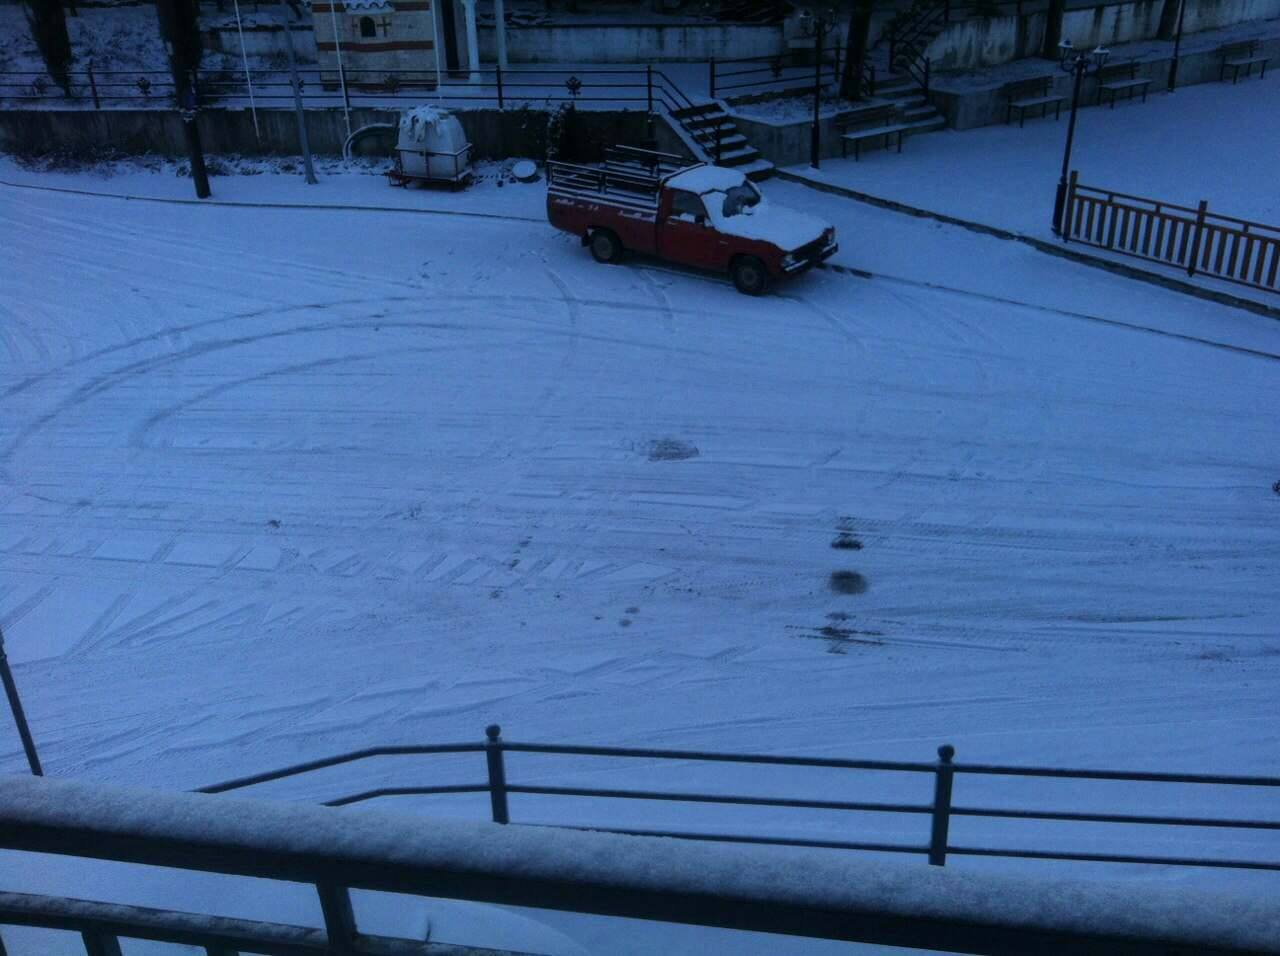 kozan.gr: Στα «λευκά» ντύθηκε και το Λιβαδερό του δήμου Σερβίων – Βελβεντού (Φωτογραφίες)